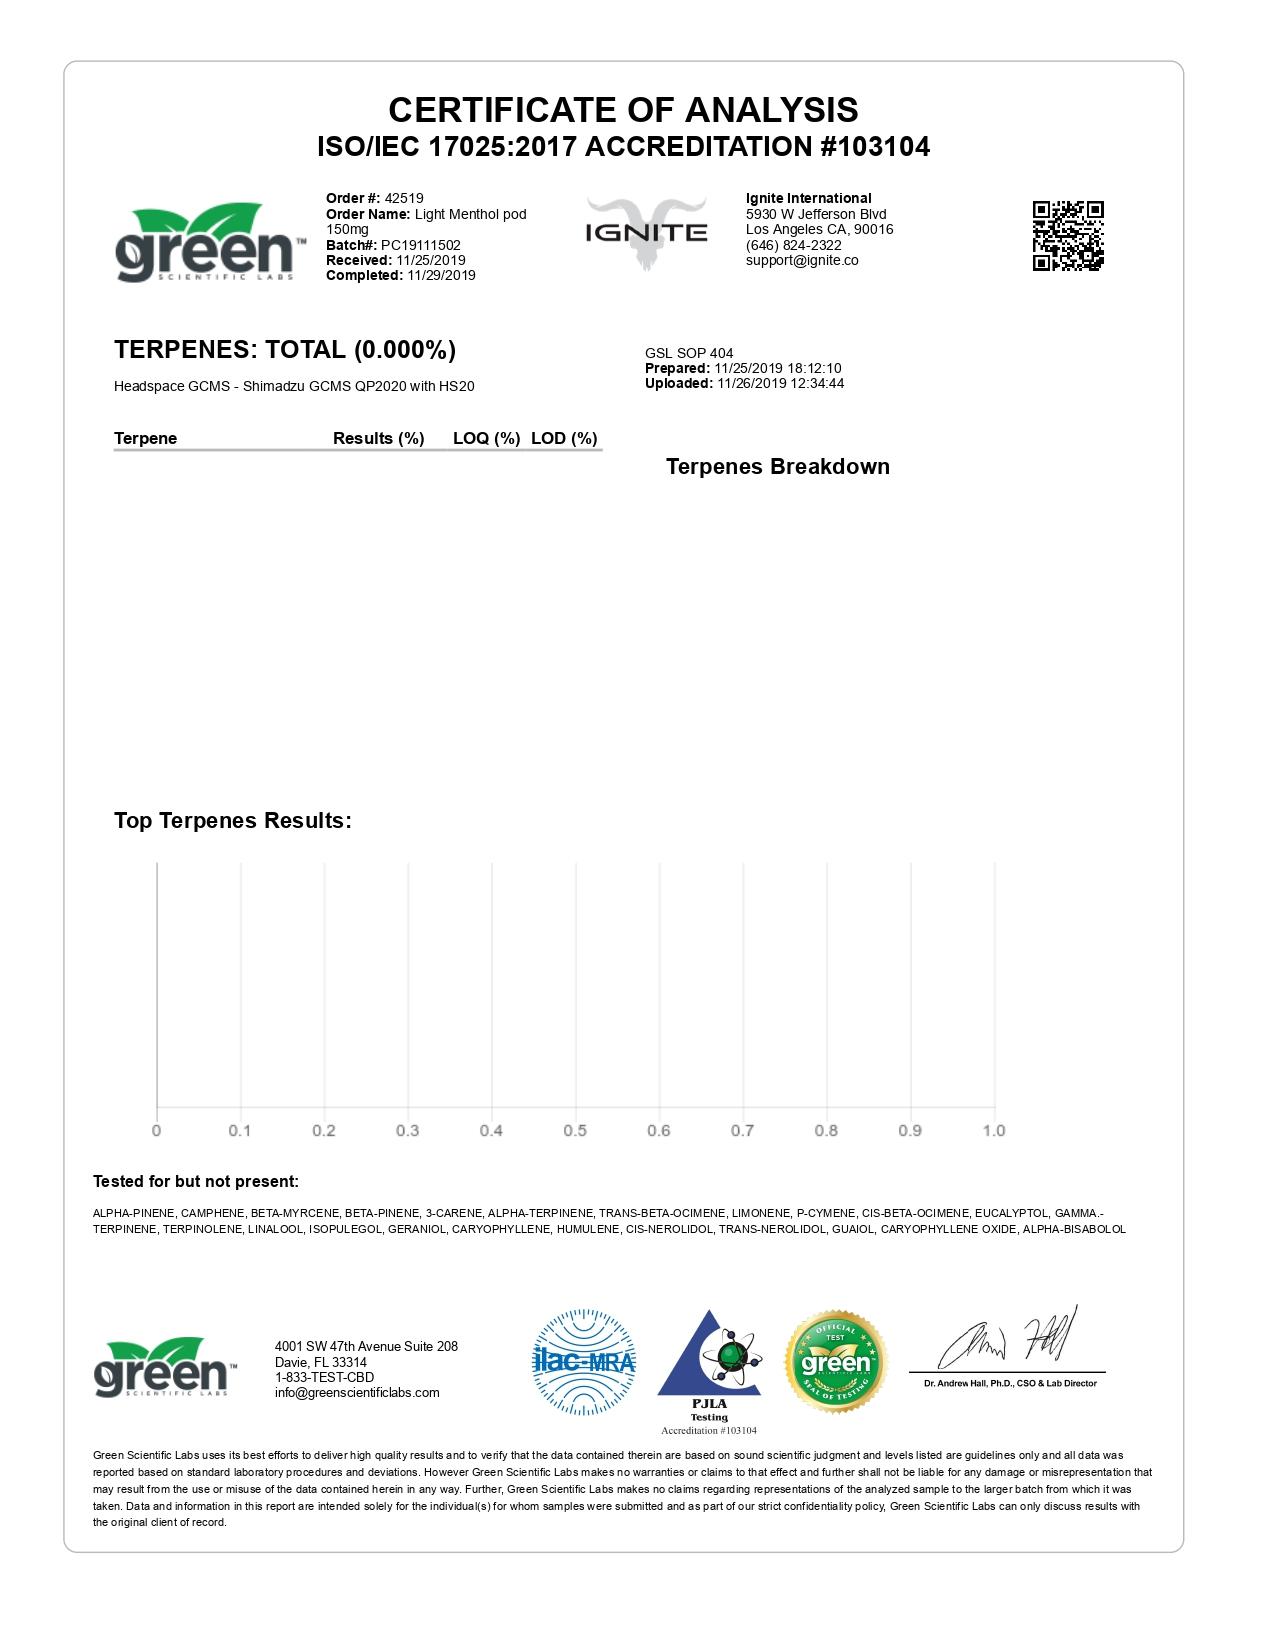 IGNITE CBD Pod Menthol Light Lab Report